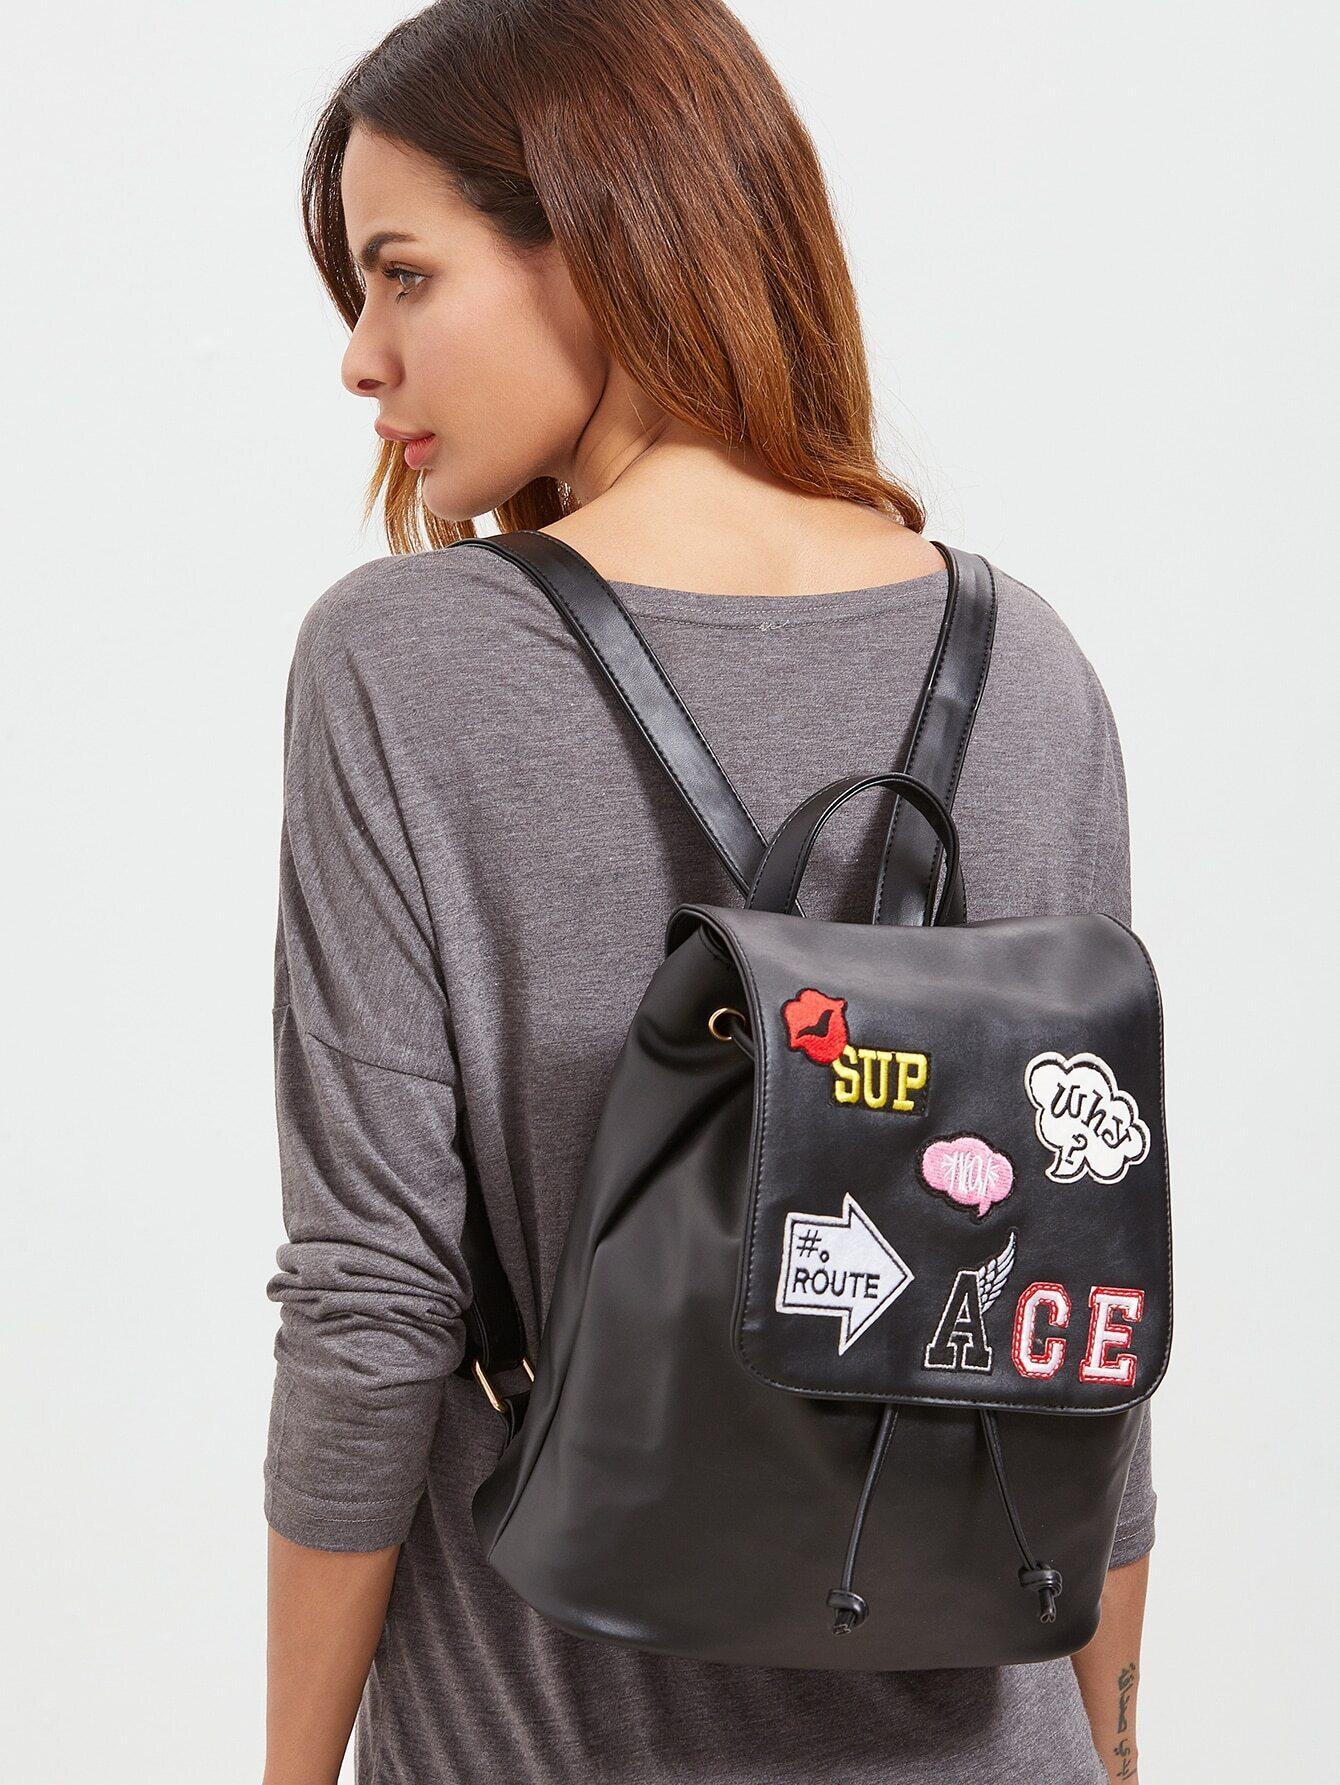 bag170104901_2